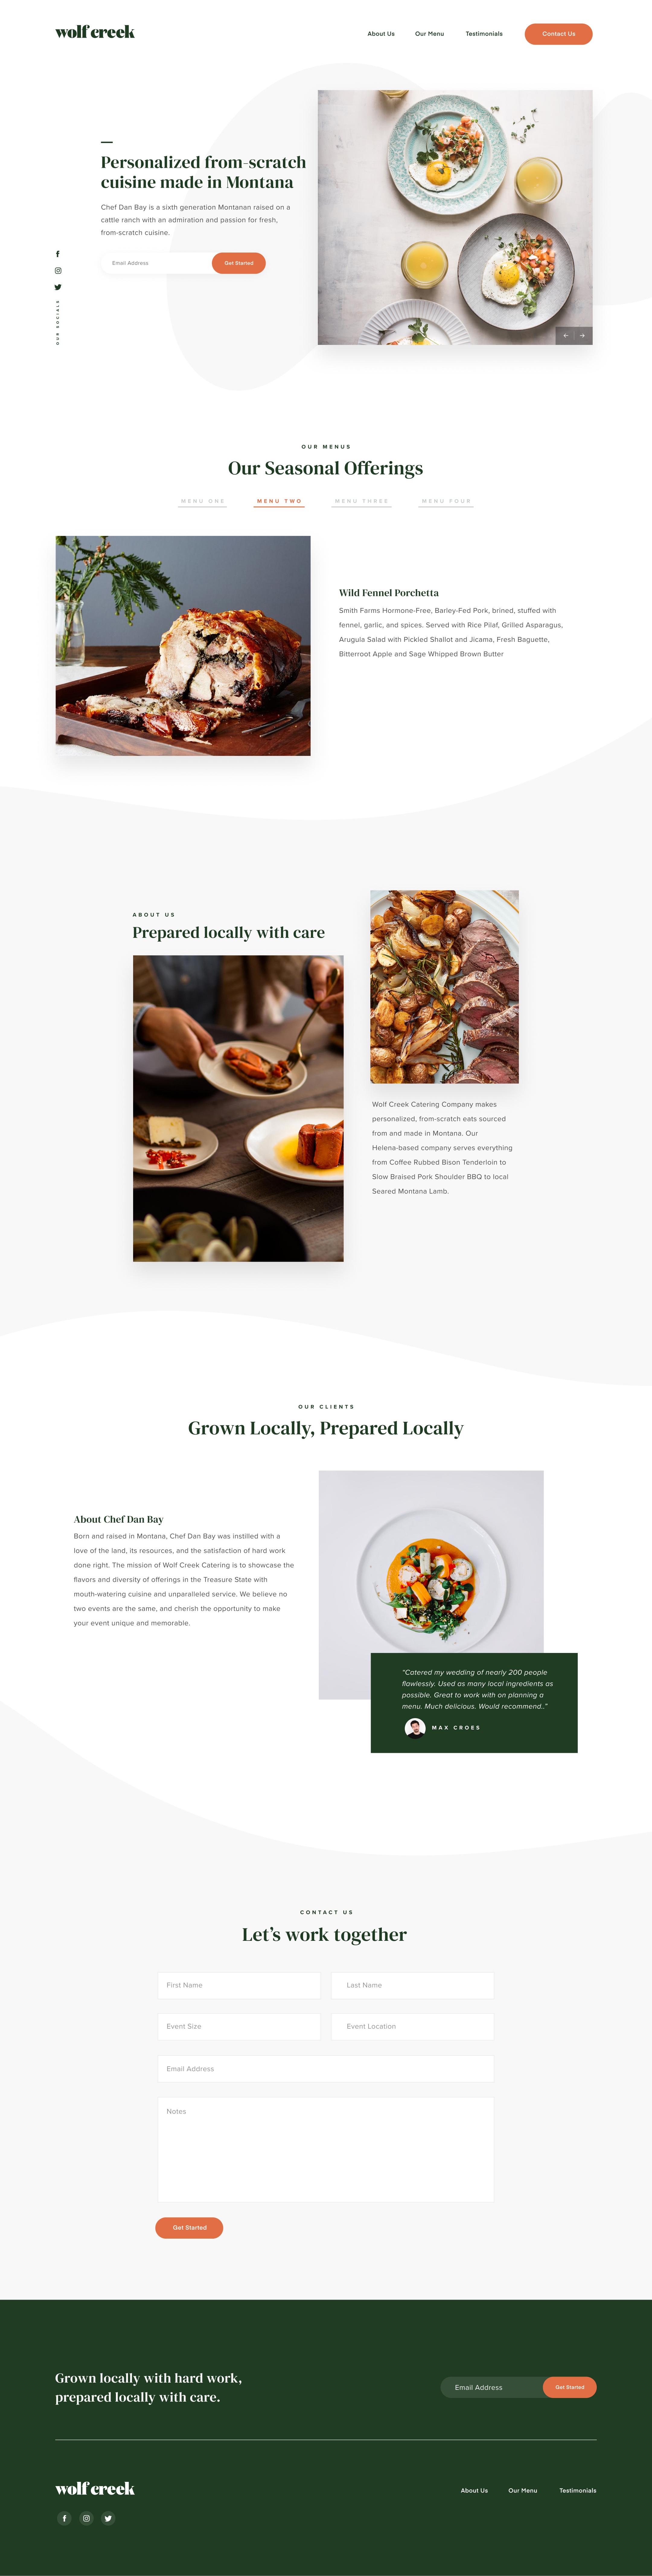 Raymond Lombardi design for Biproxi website design.